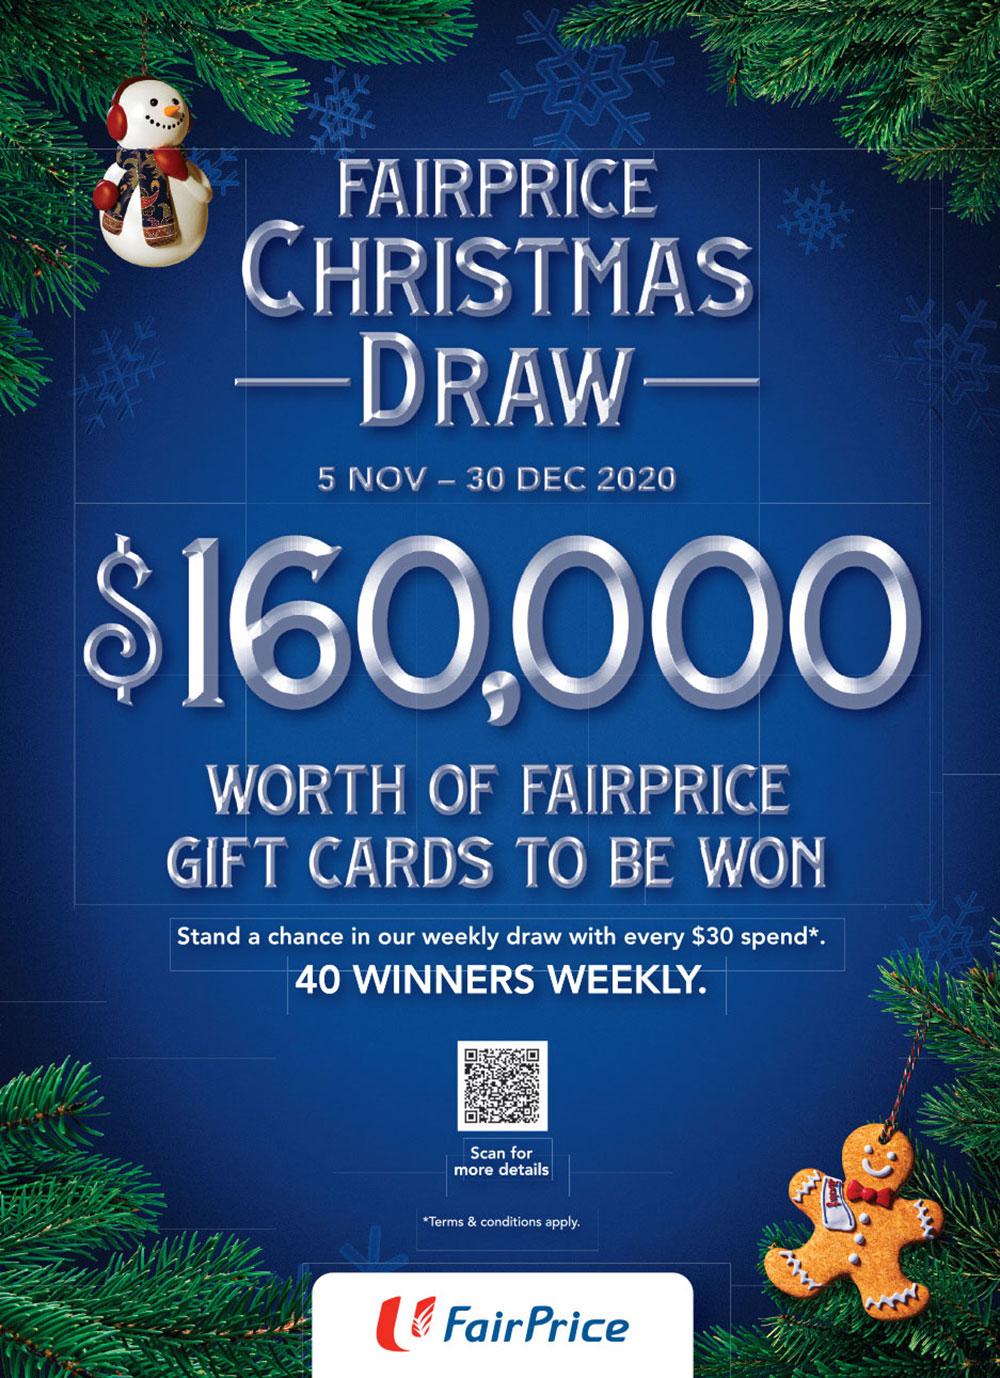 FairPrice Christmas Catalogue 2020 - Christmas Draw